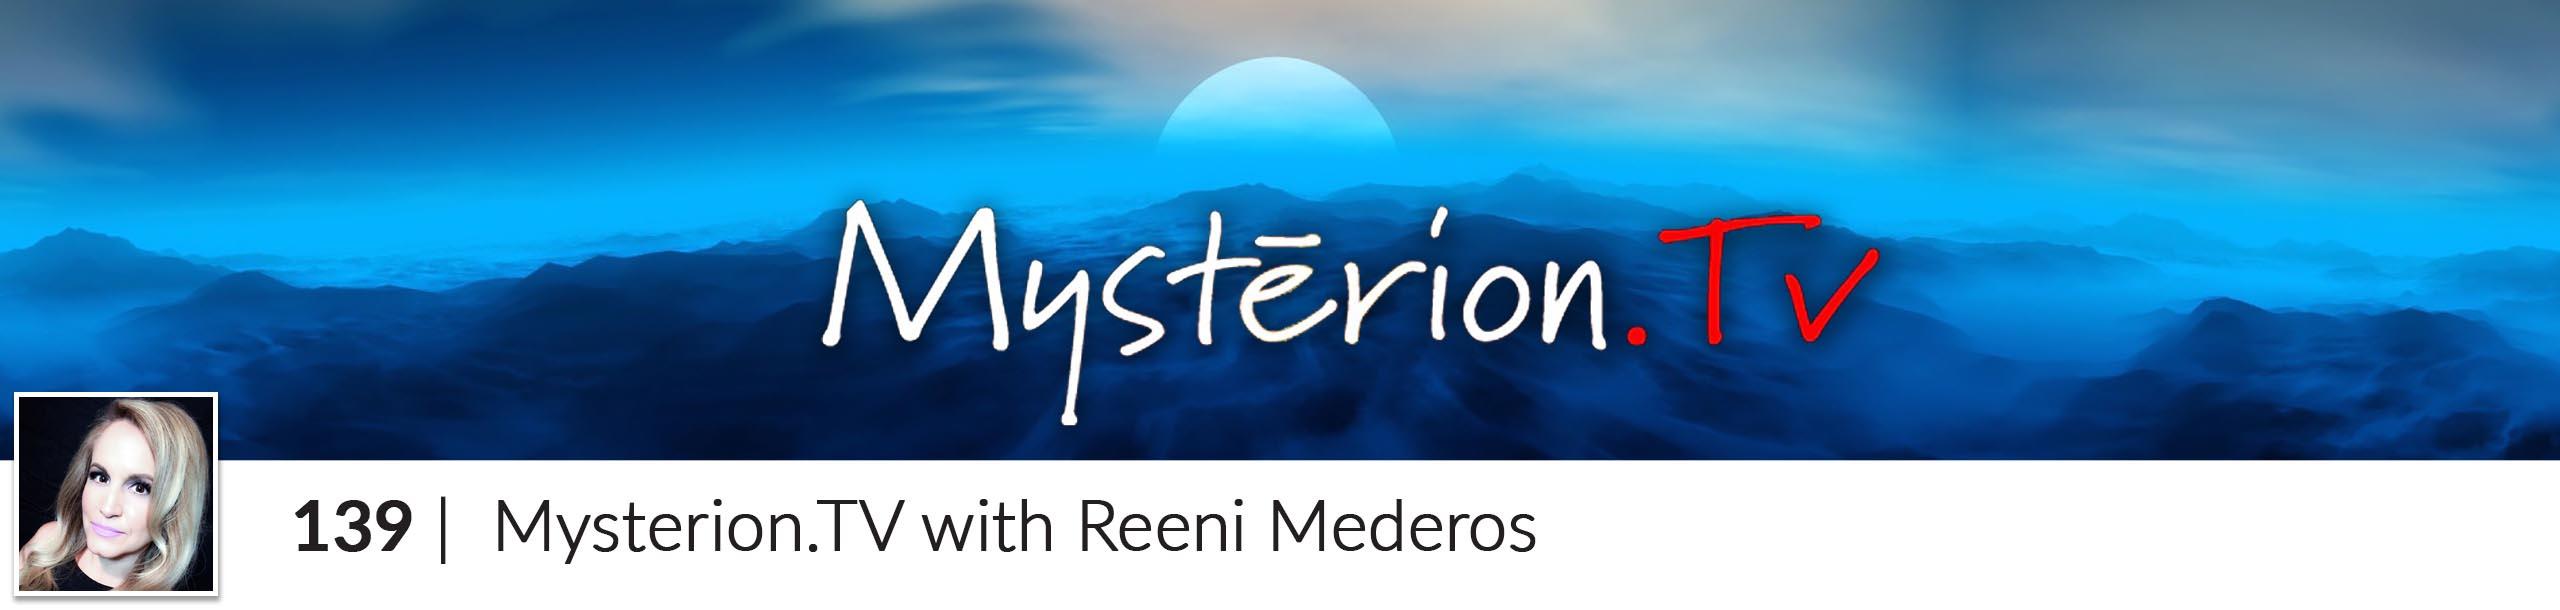 Mysterion_header1